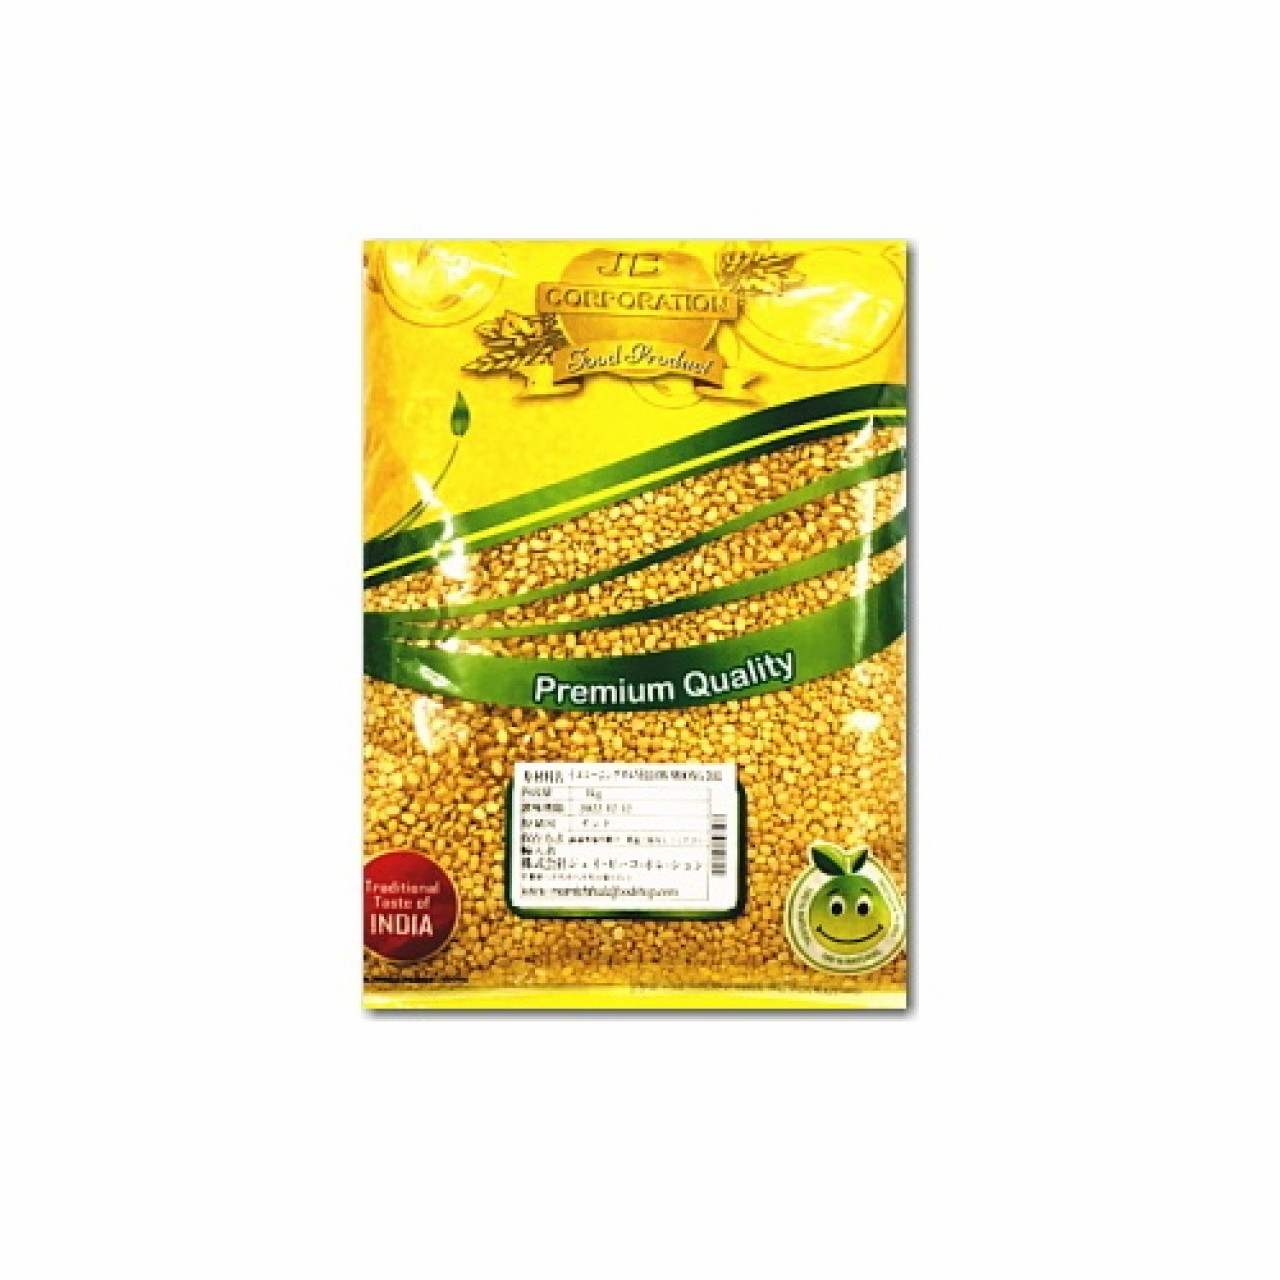 Jb yellow moong dal 1kg - RHF